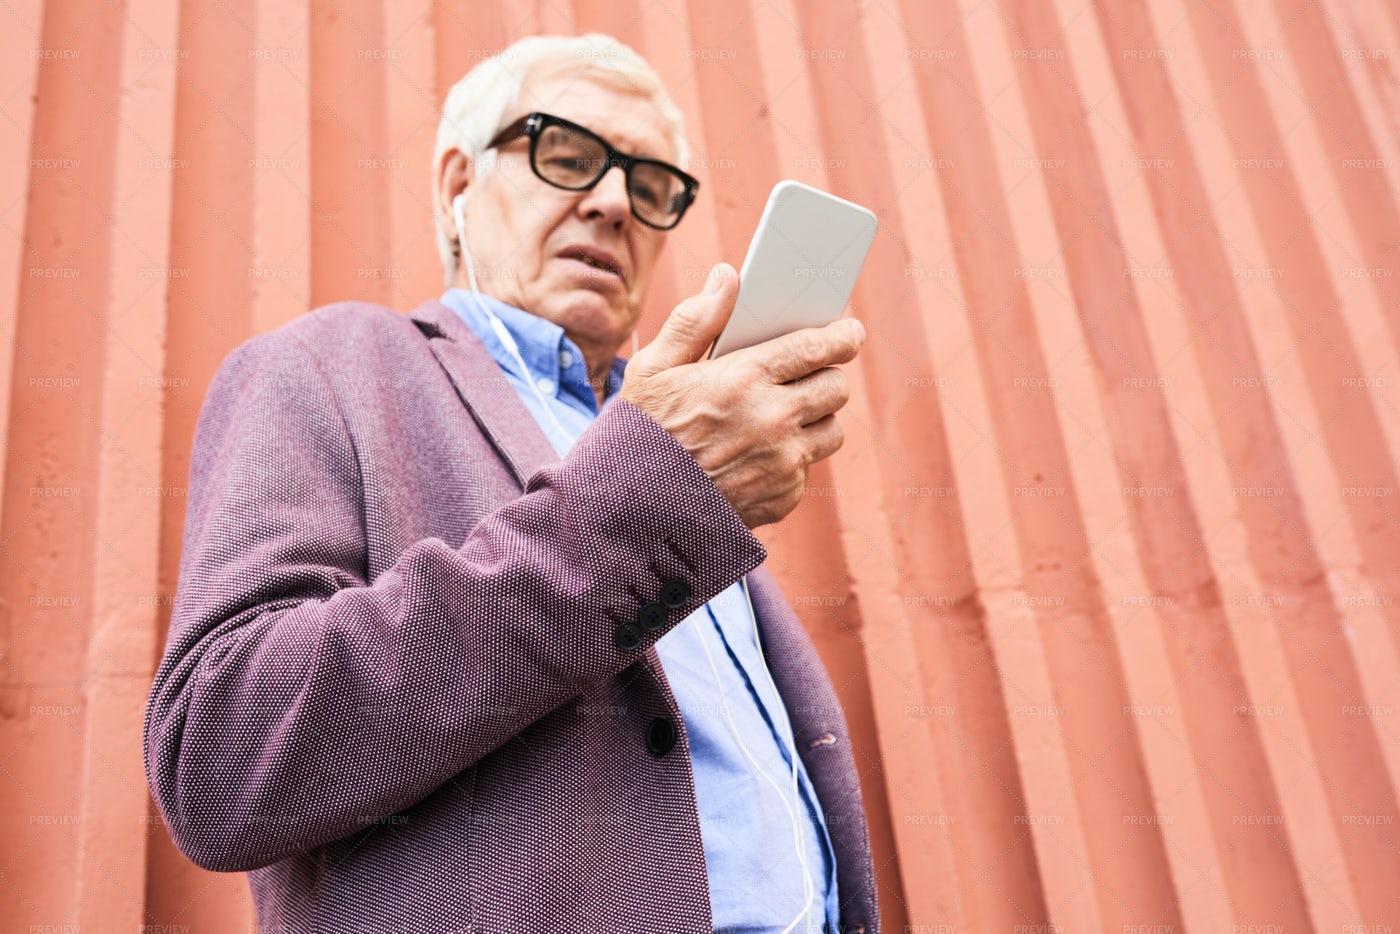 Trendy Senior Man Holding...: Stock Photos